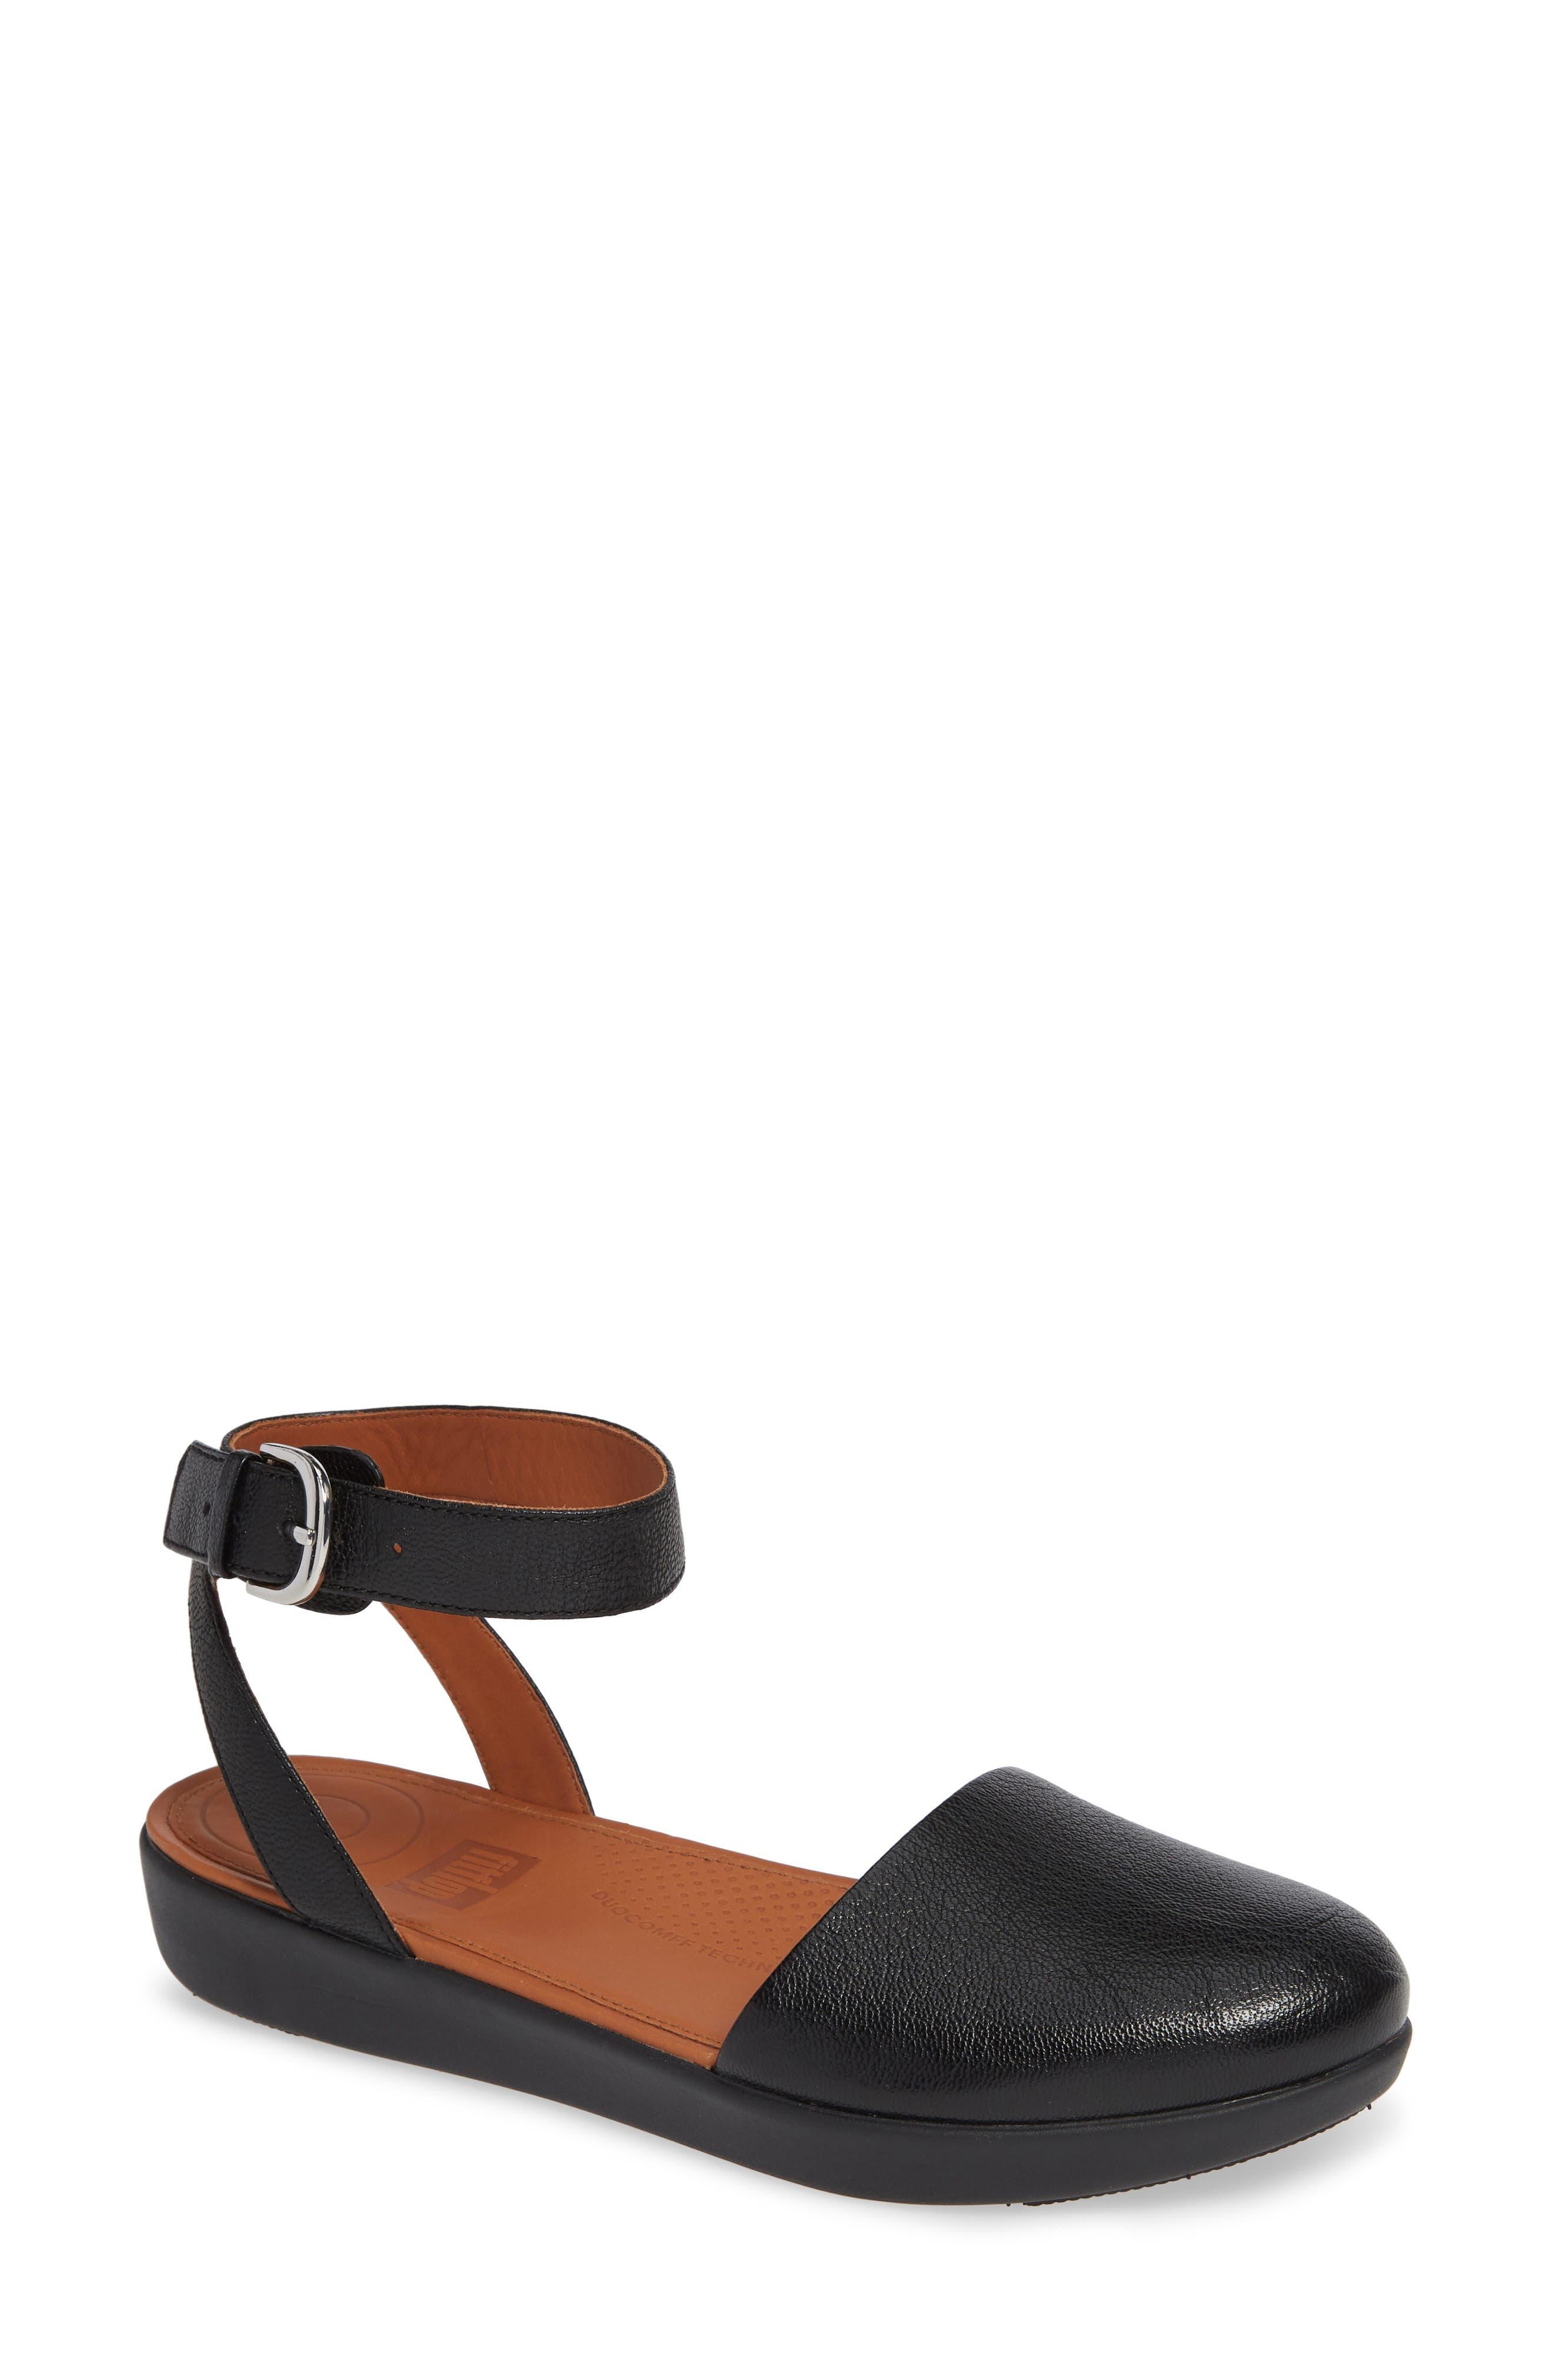 Cova Ankle Strap Sandal,                         Main,                         color, BLACK LEATHER